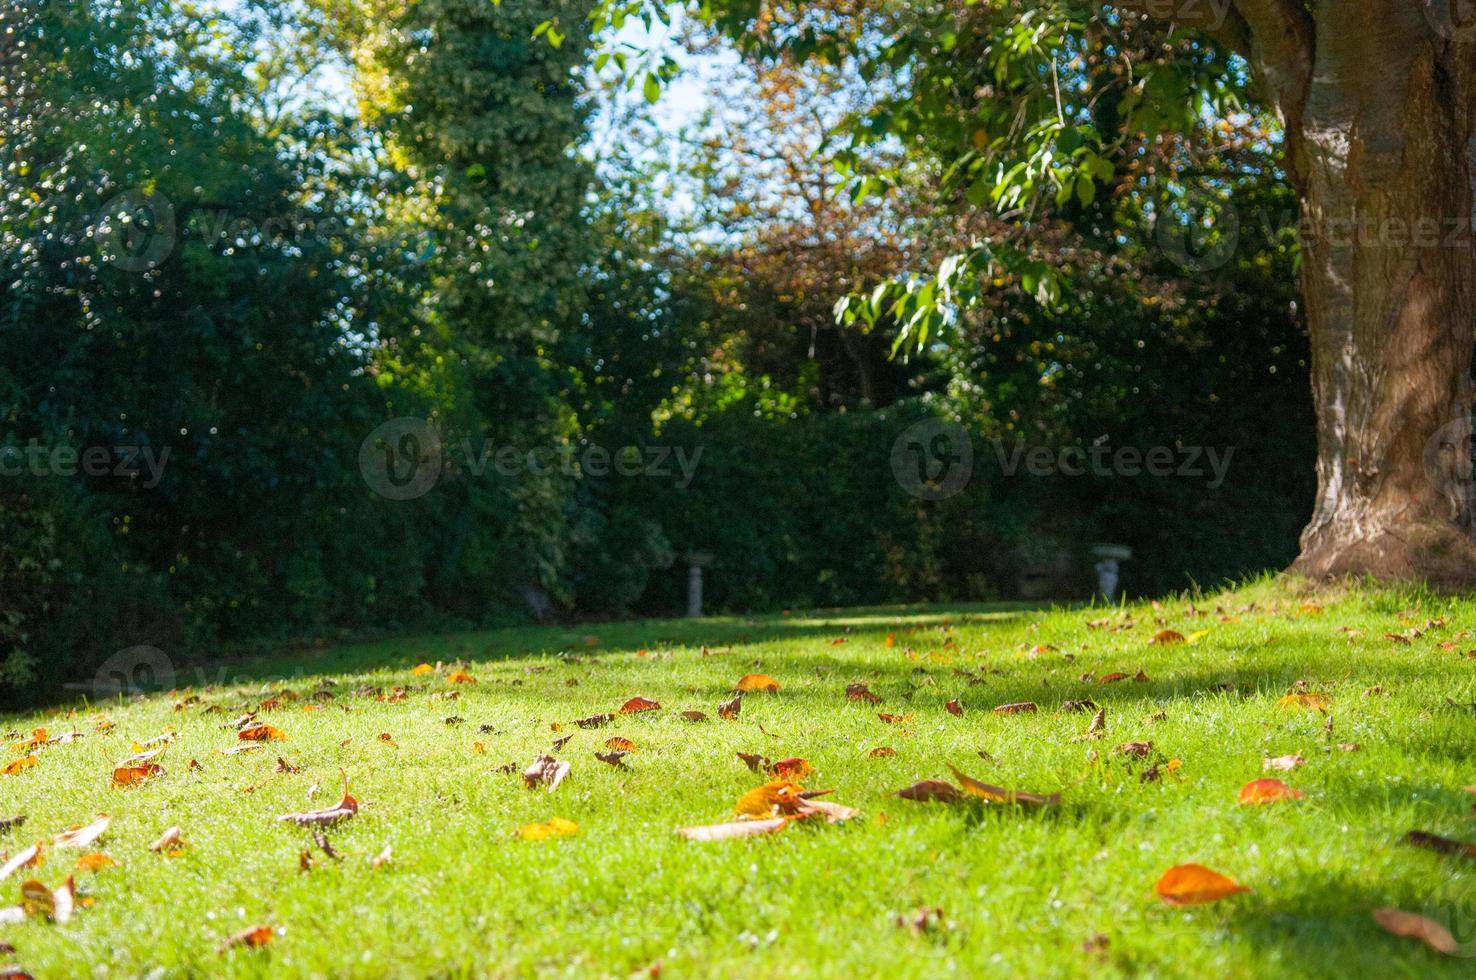 cena do jardim outono foto